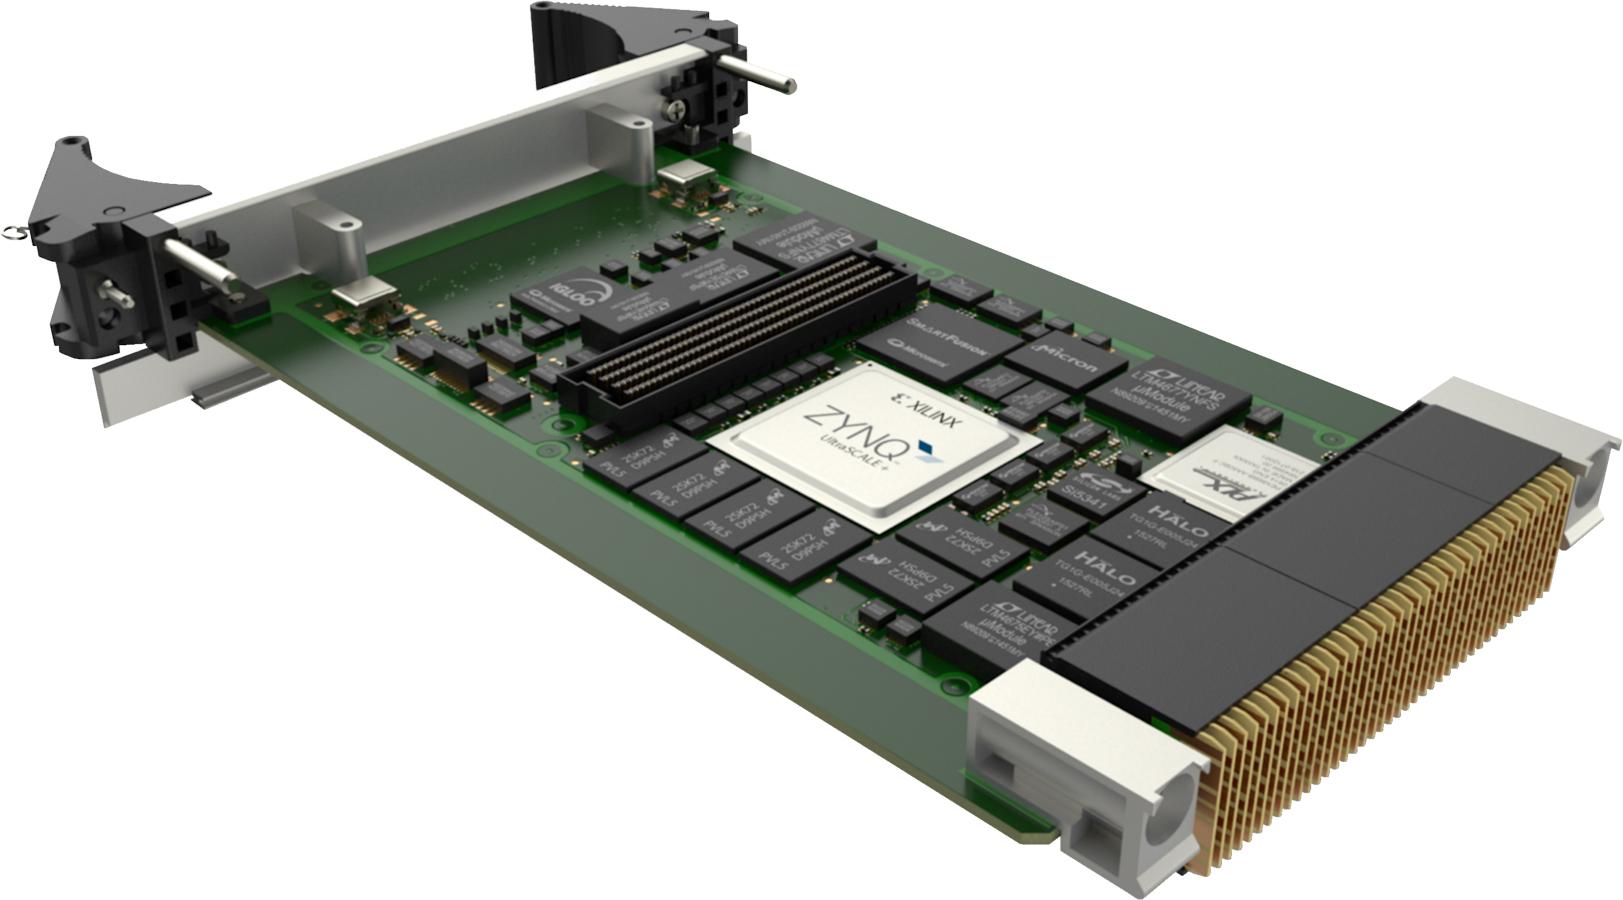 VPX3-ZU1 OpenVPX Xilinx Zynq ultrascale FPGA card